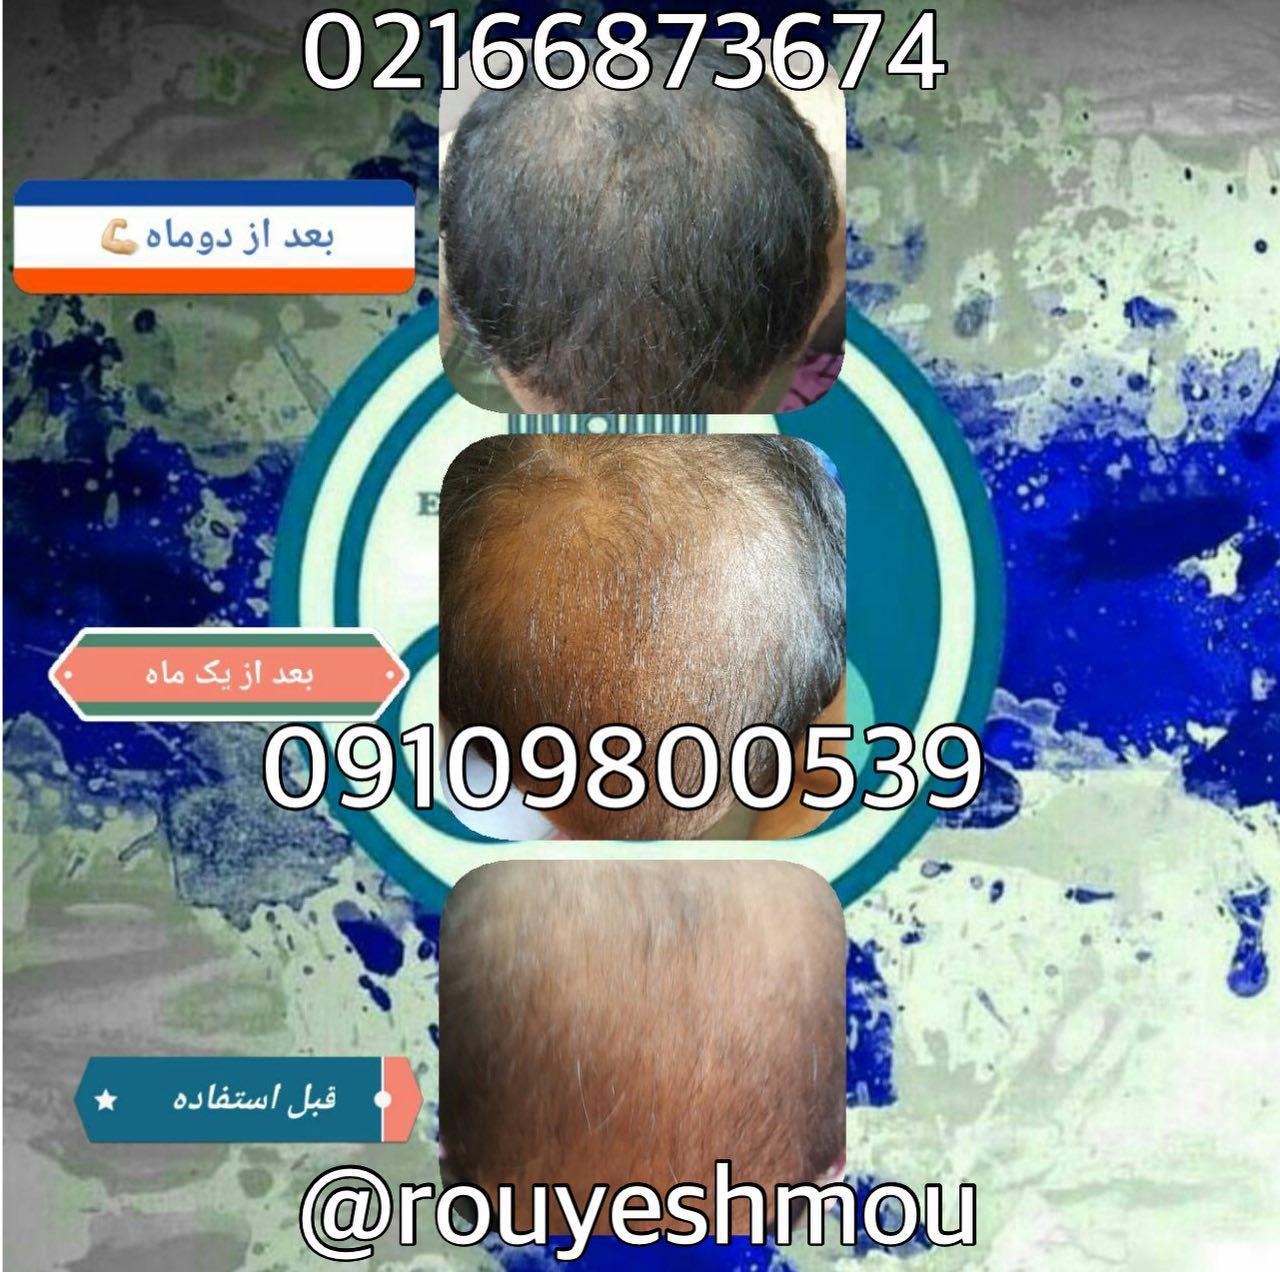 photo 2017 11 05 19 37 58 - روش های افزایش رشد مو دکترنوروزیان